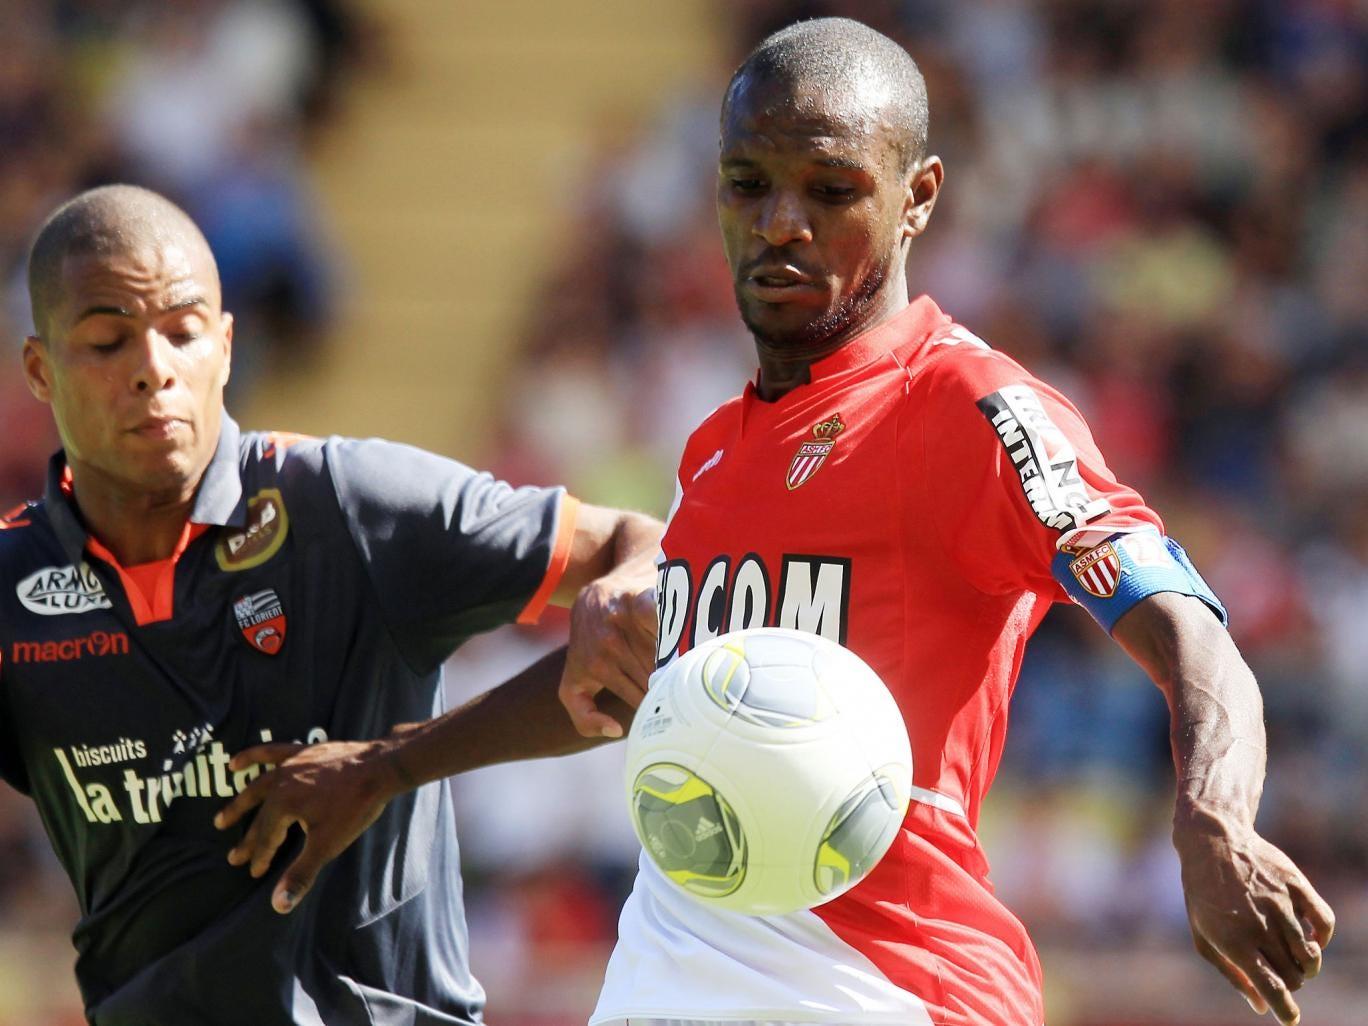 Eric Abidal now captains the AS Monaco side